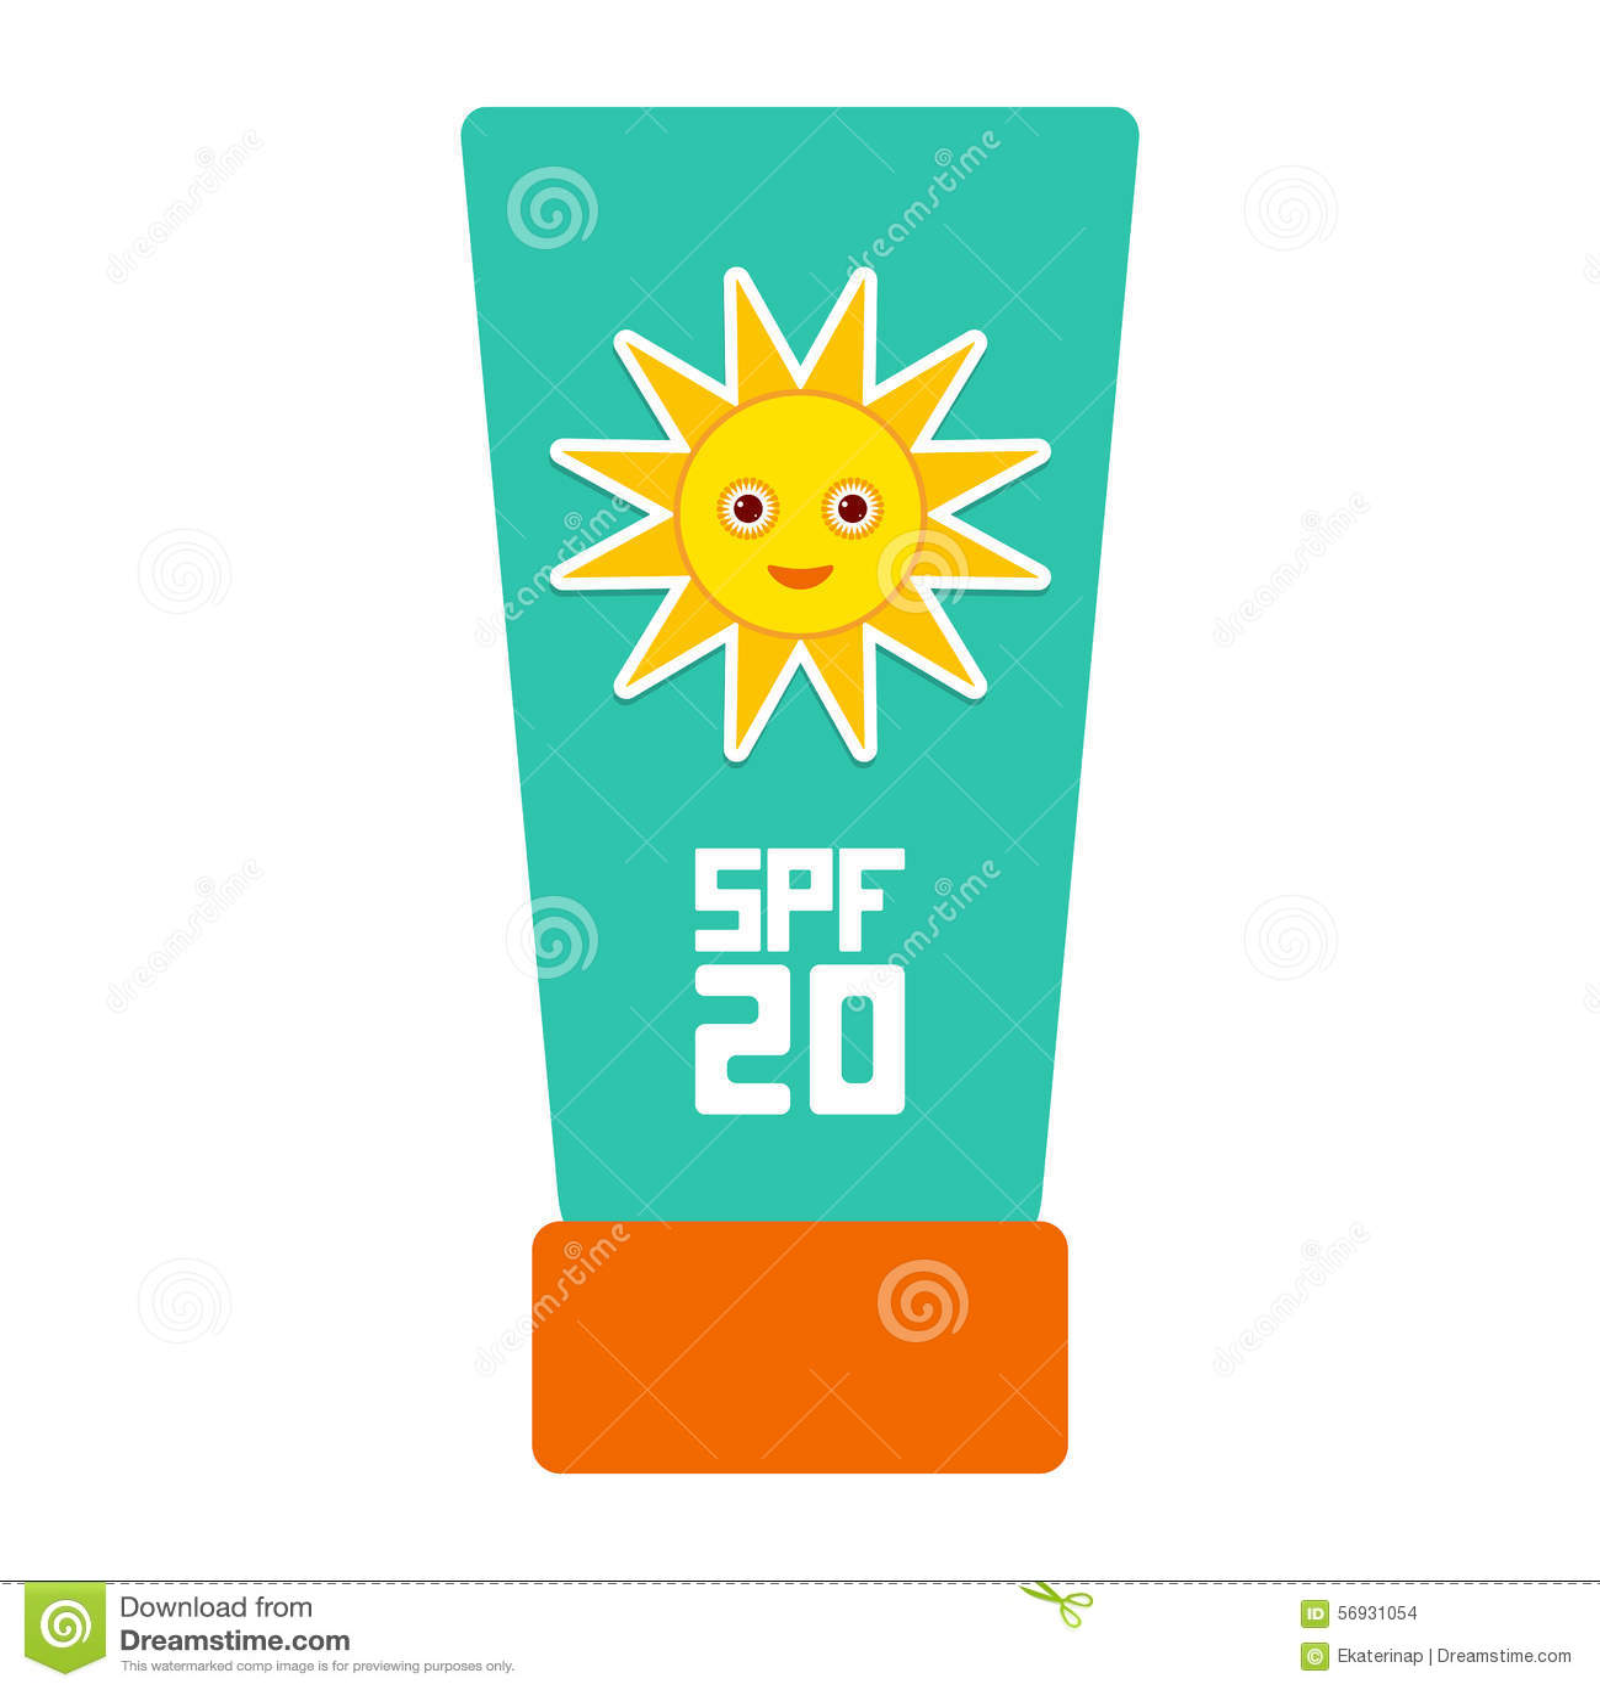 suntan lotion sun cream container sunscreen spf 20 the black clipart men's day images black clip art images